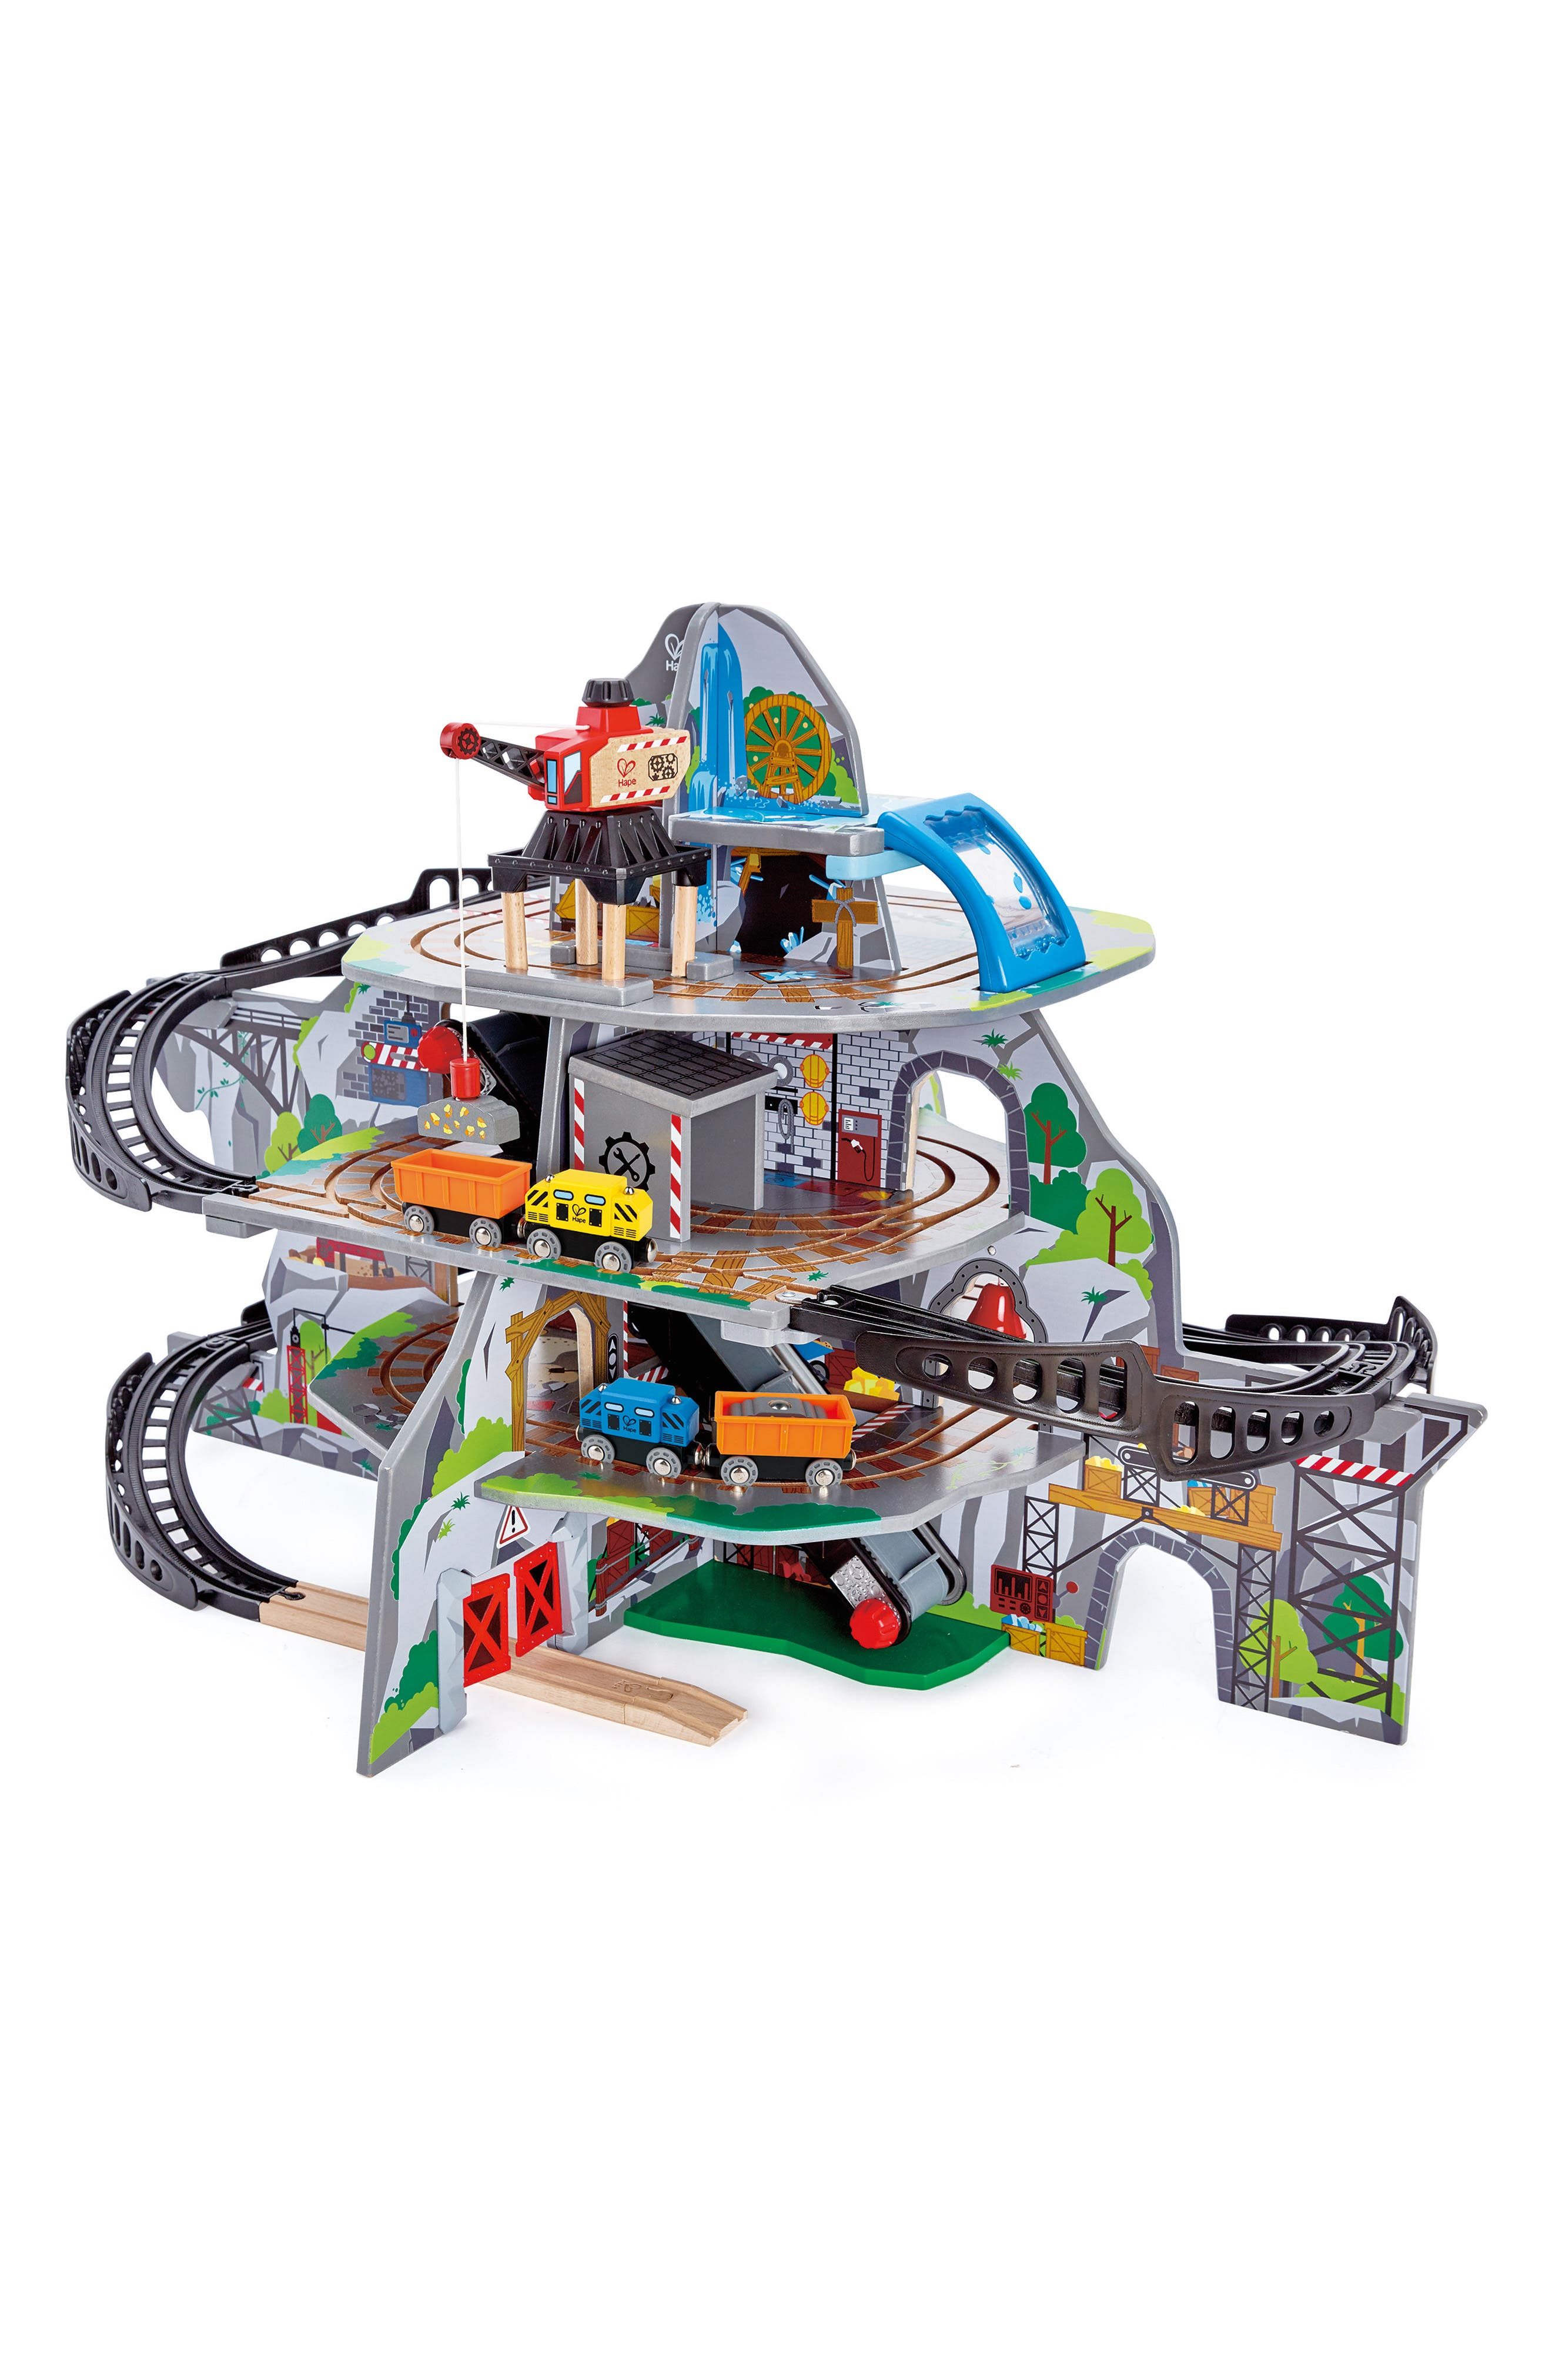 Main Image - Hape Mighty Mountain Mine Railway Set